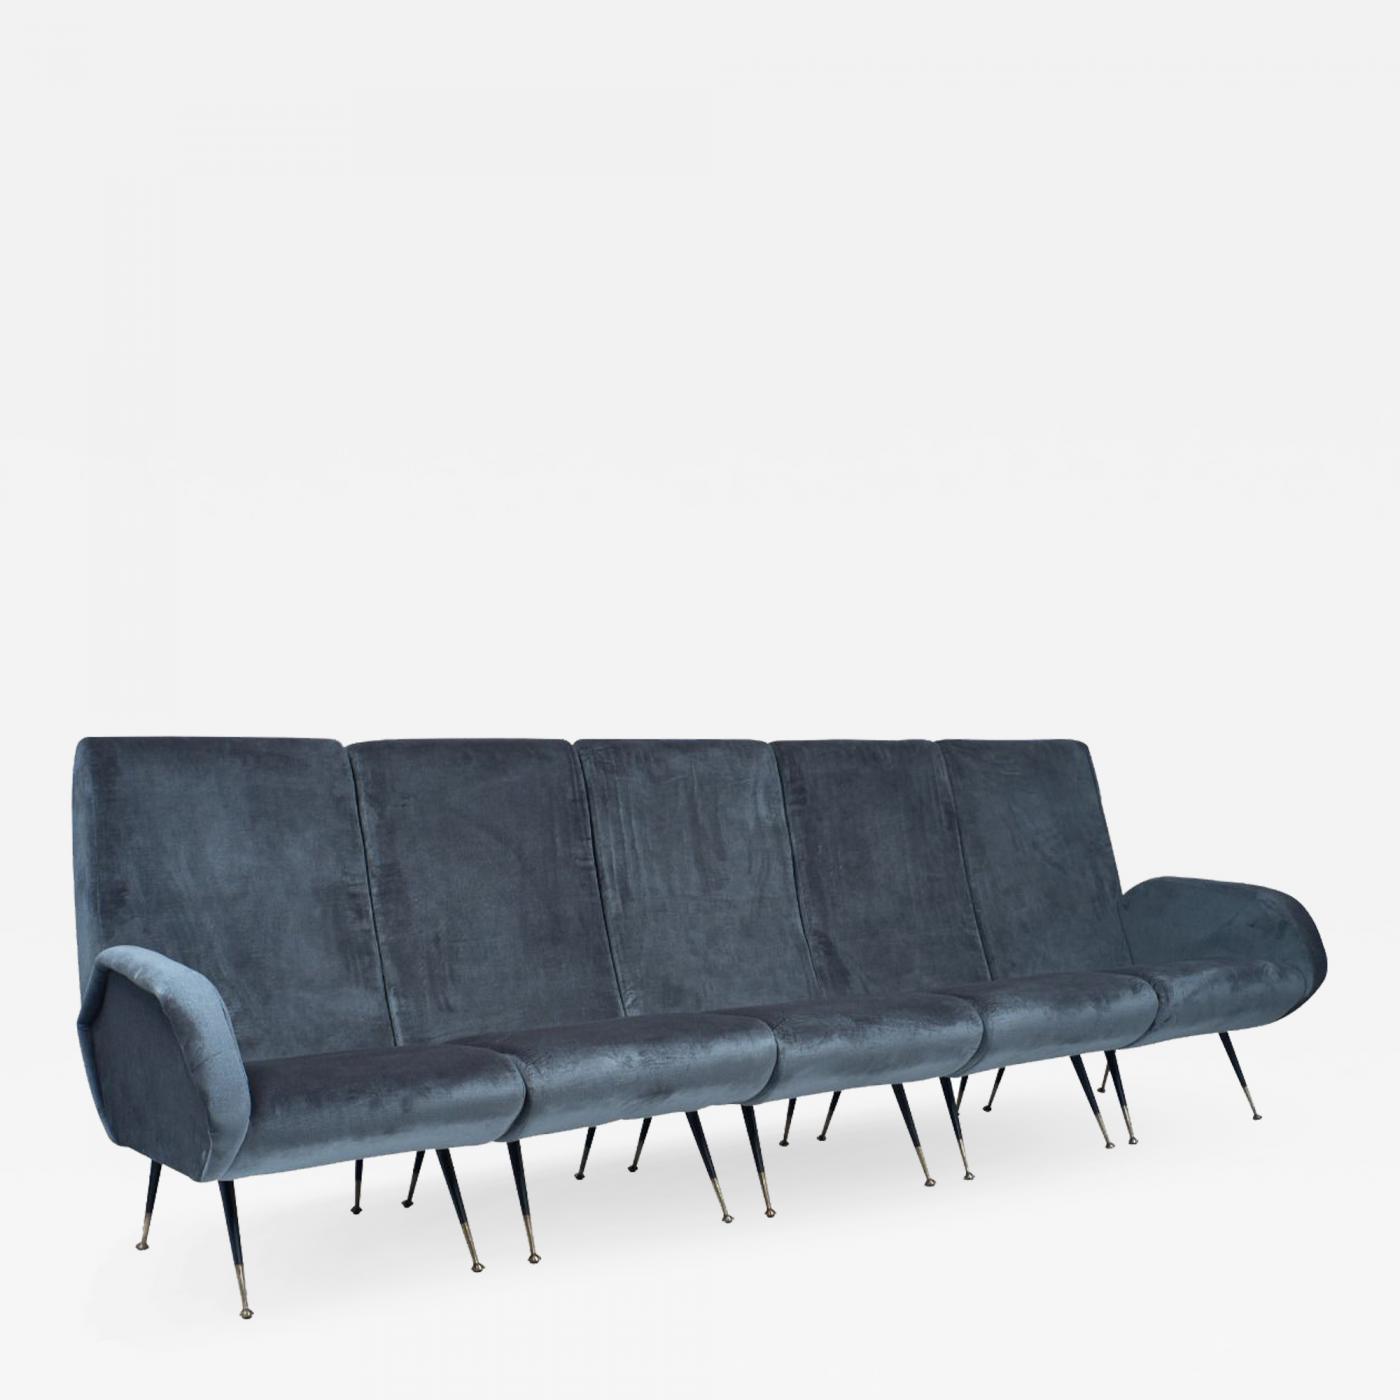 Italian Mid-Century Sectional Sofa